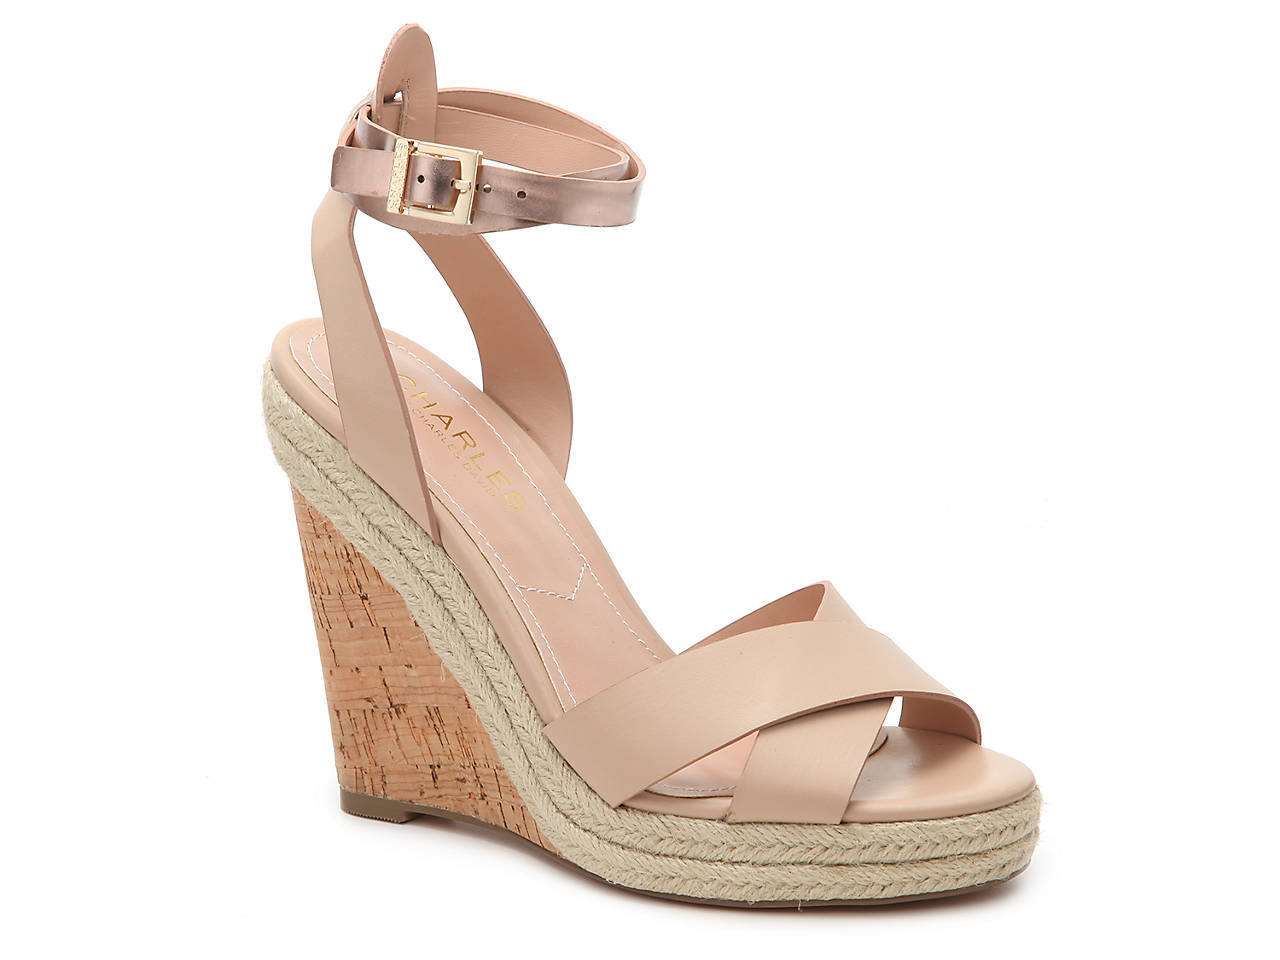 774ecb7ac Charles by Charles David Brit Wedge Sandal Women s Shoes